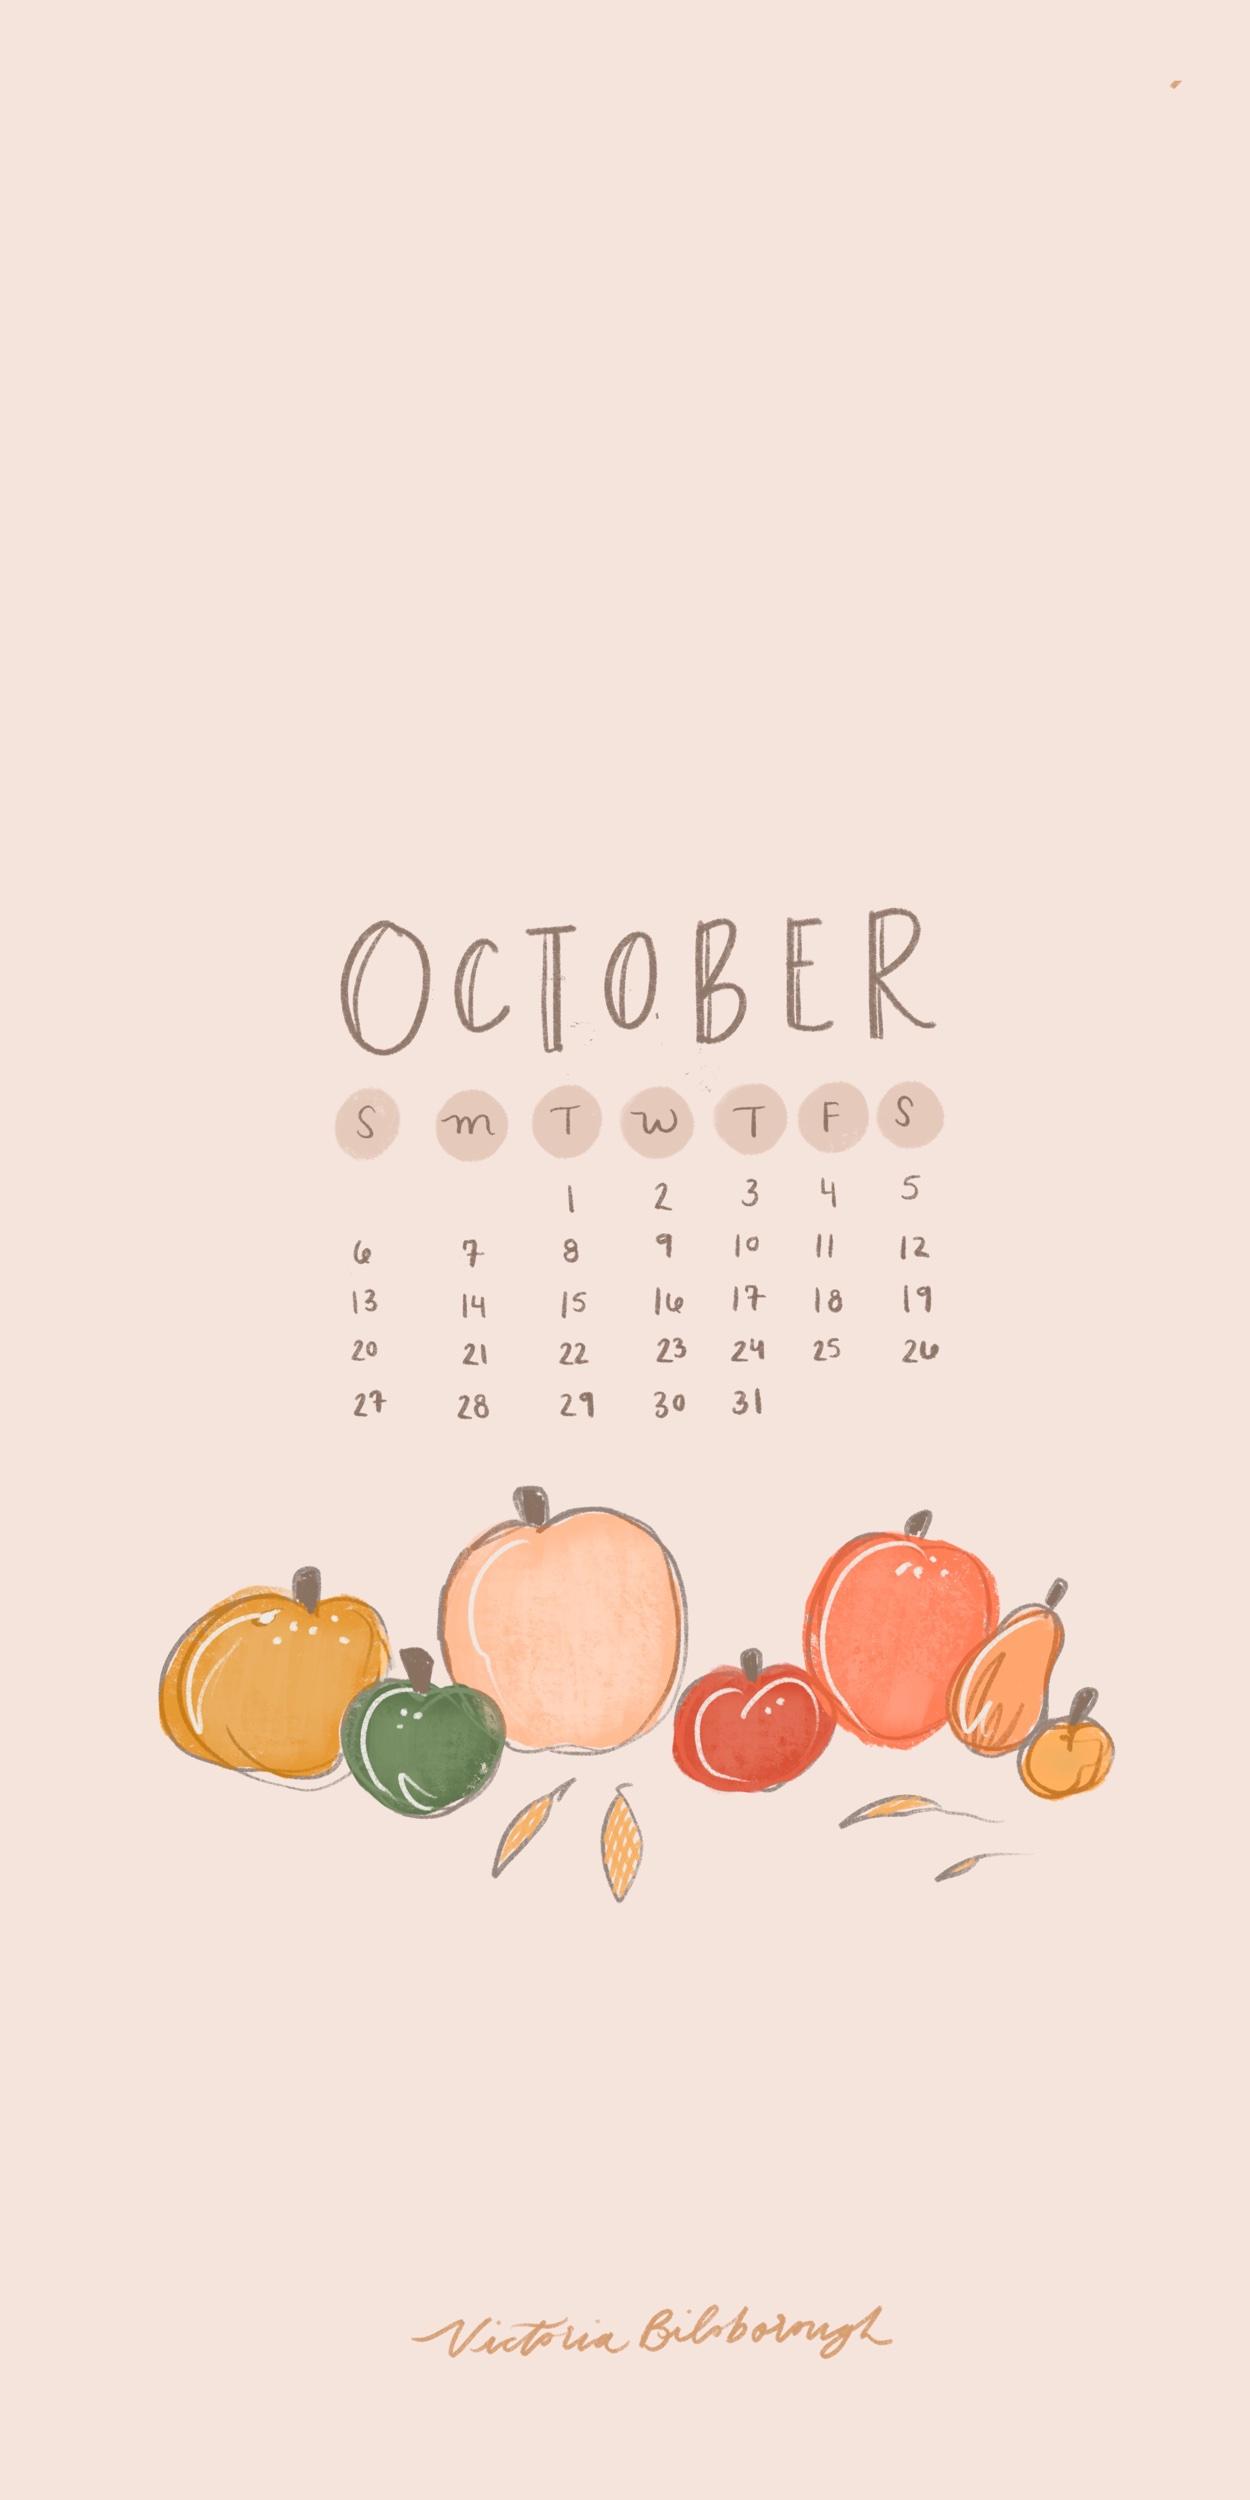 Victoria Bilsborough | October 2019 Phone Wallpapers